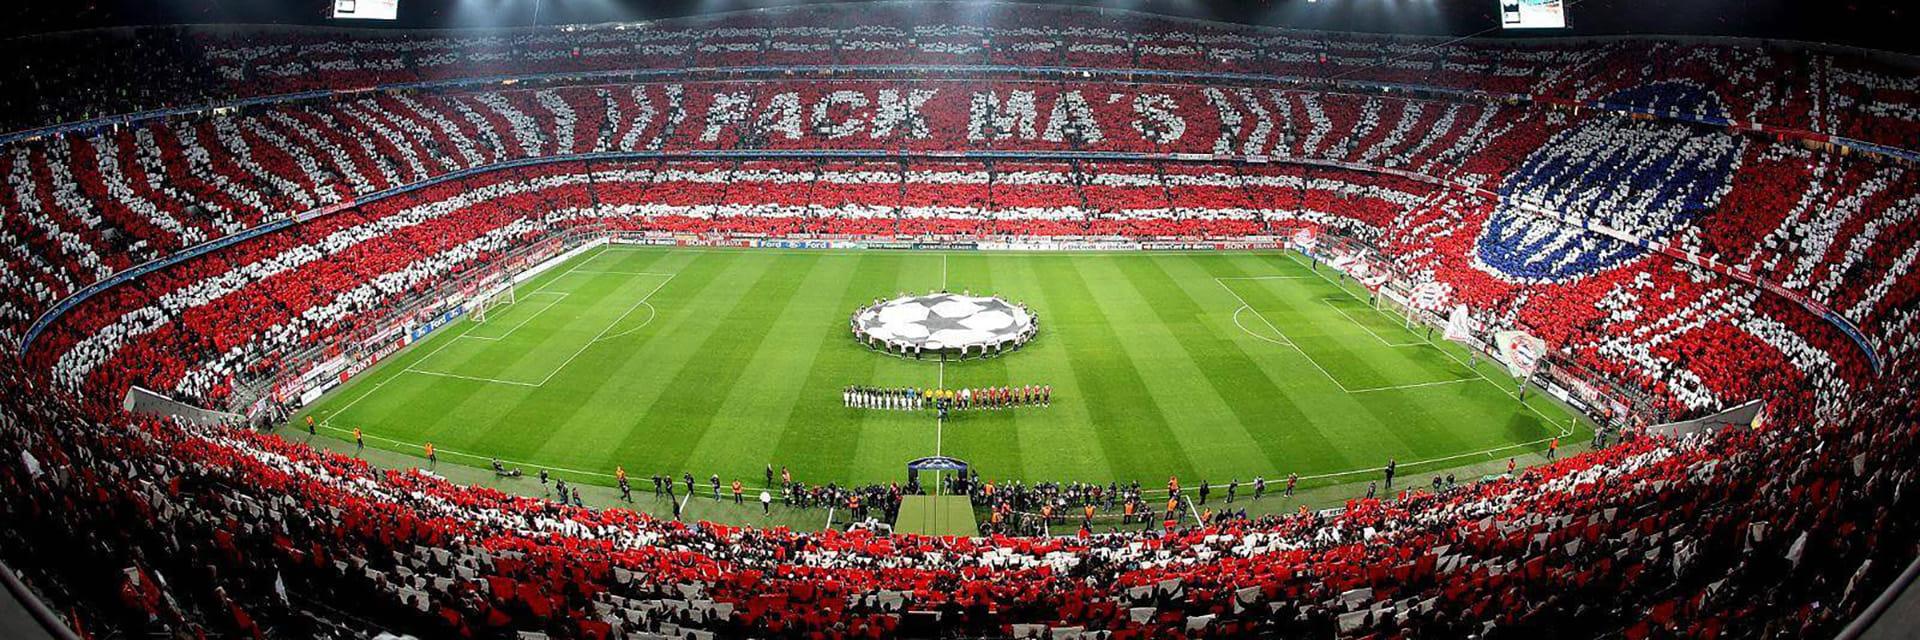 Bayern Munich - Hannover 96, 6 Mayat 0:00